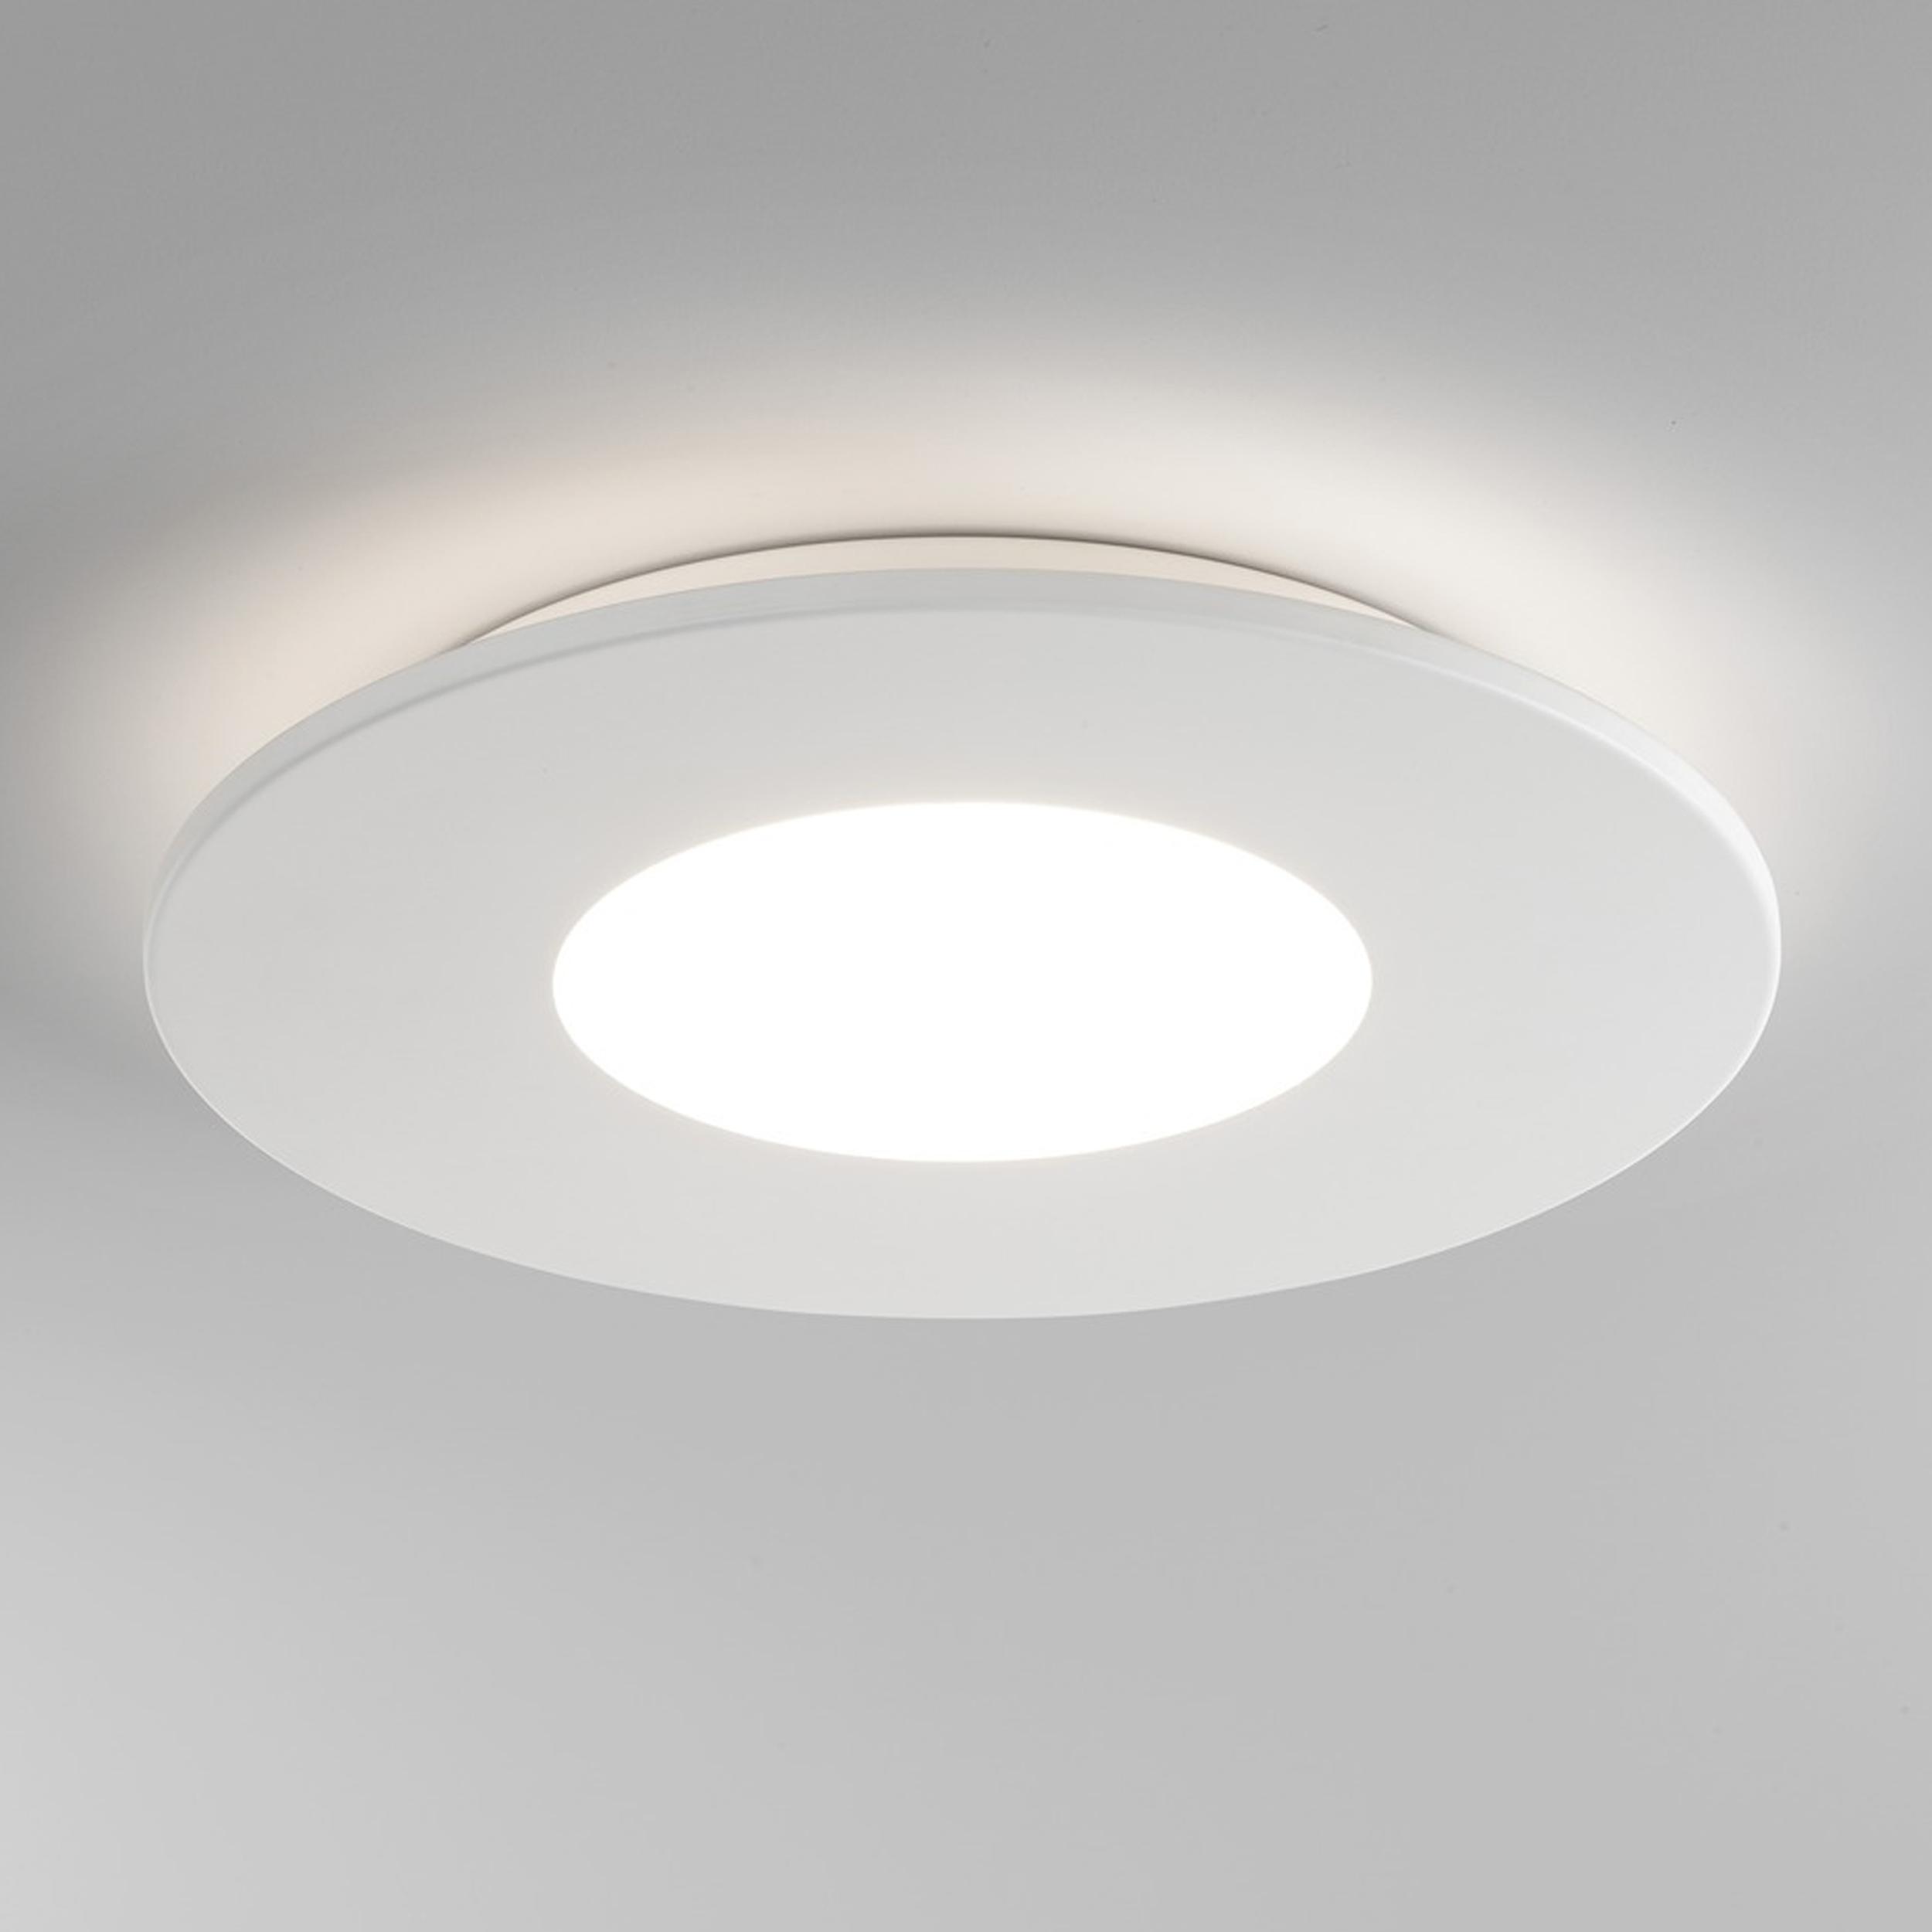 Astro zero round led ceiling light matt white